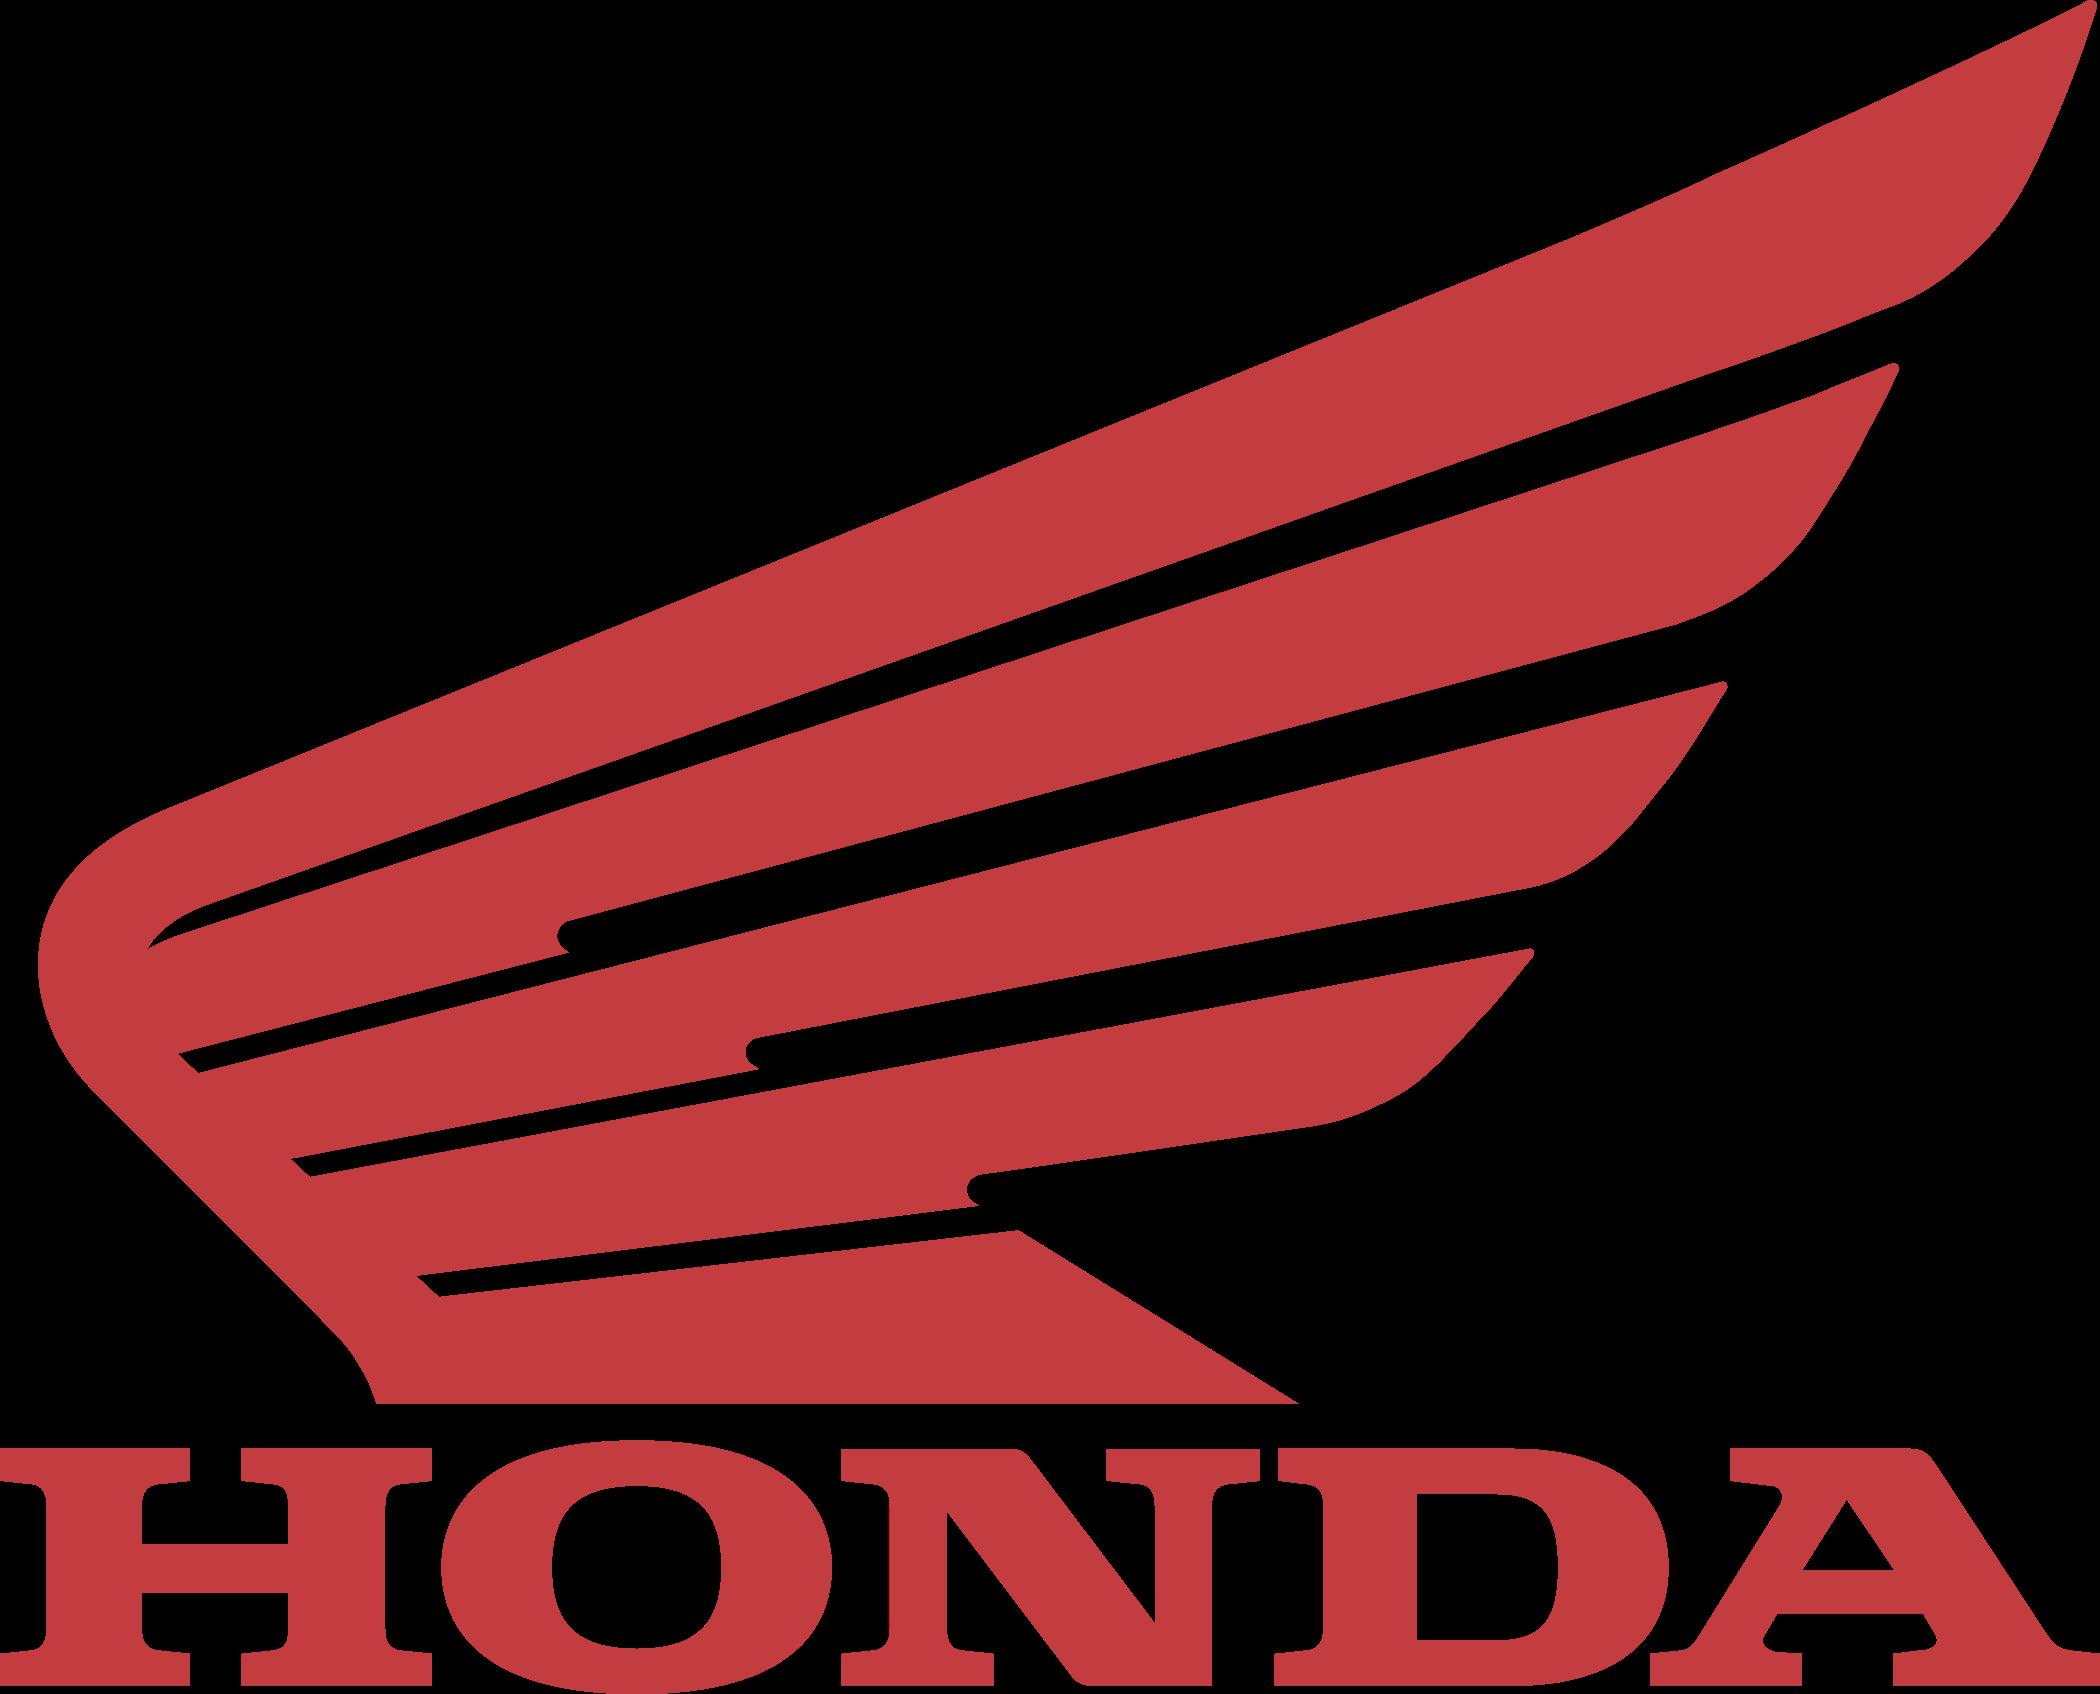 honda motos logo 7 - Honda Motorcycles Logo